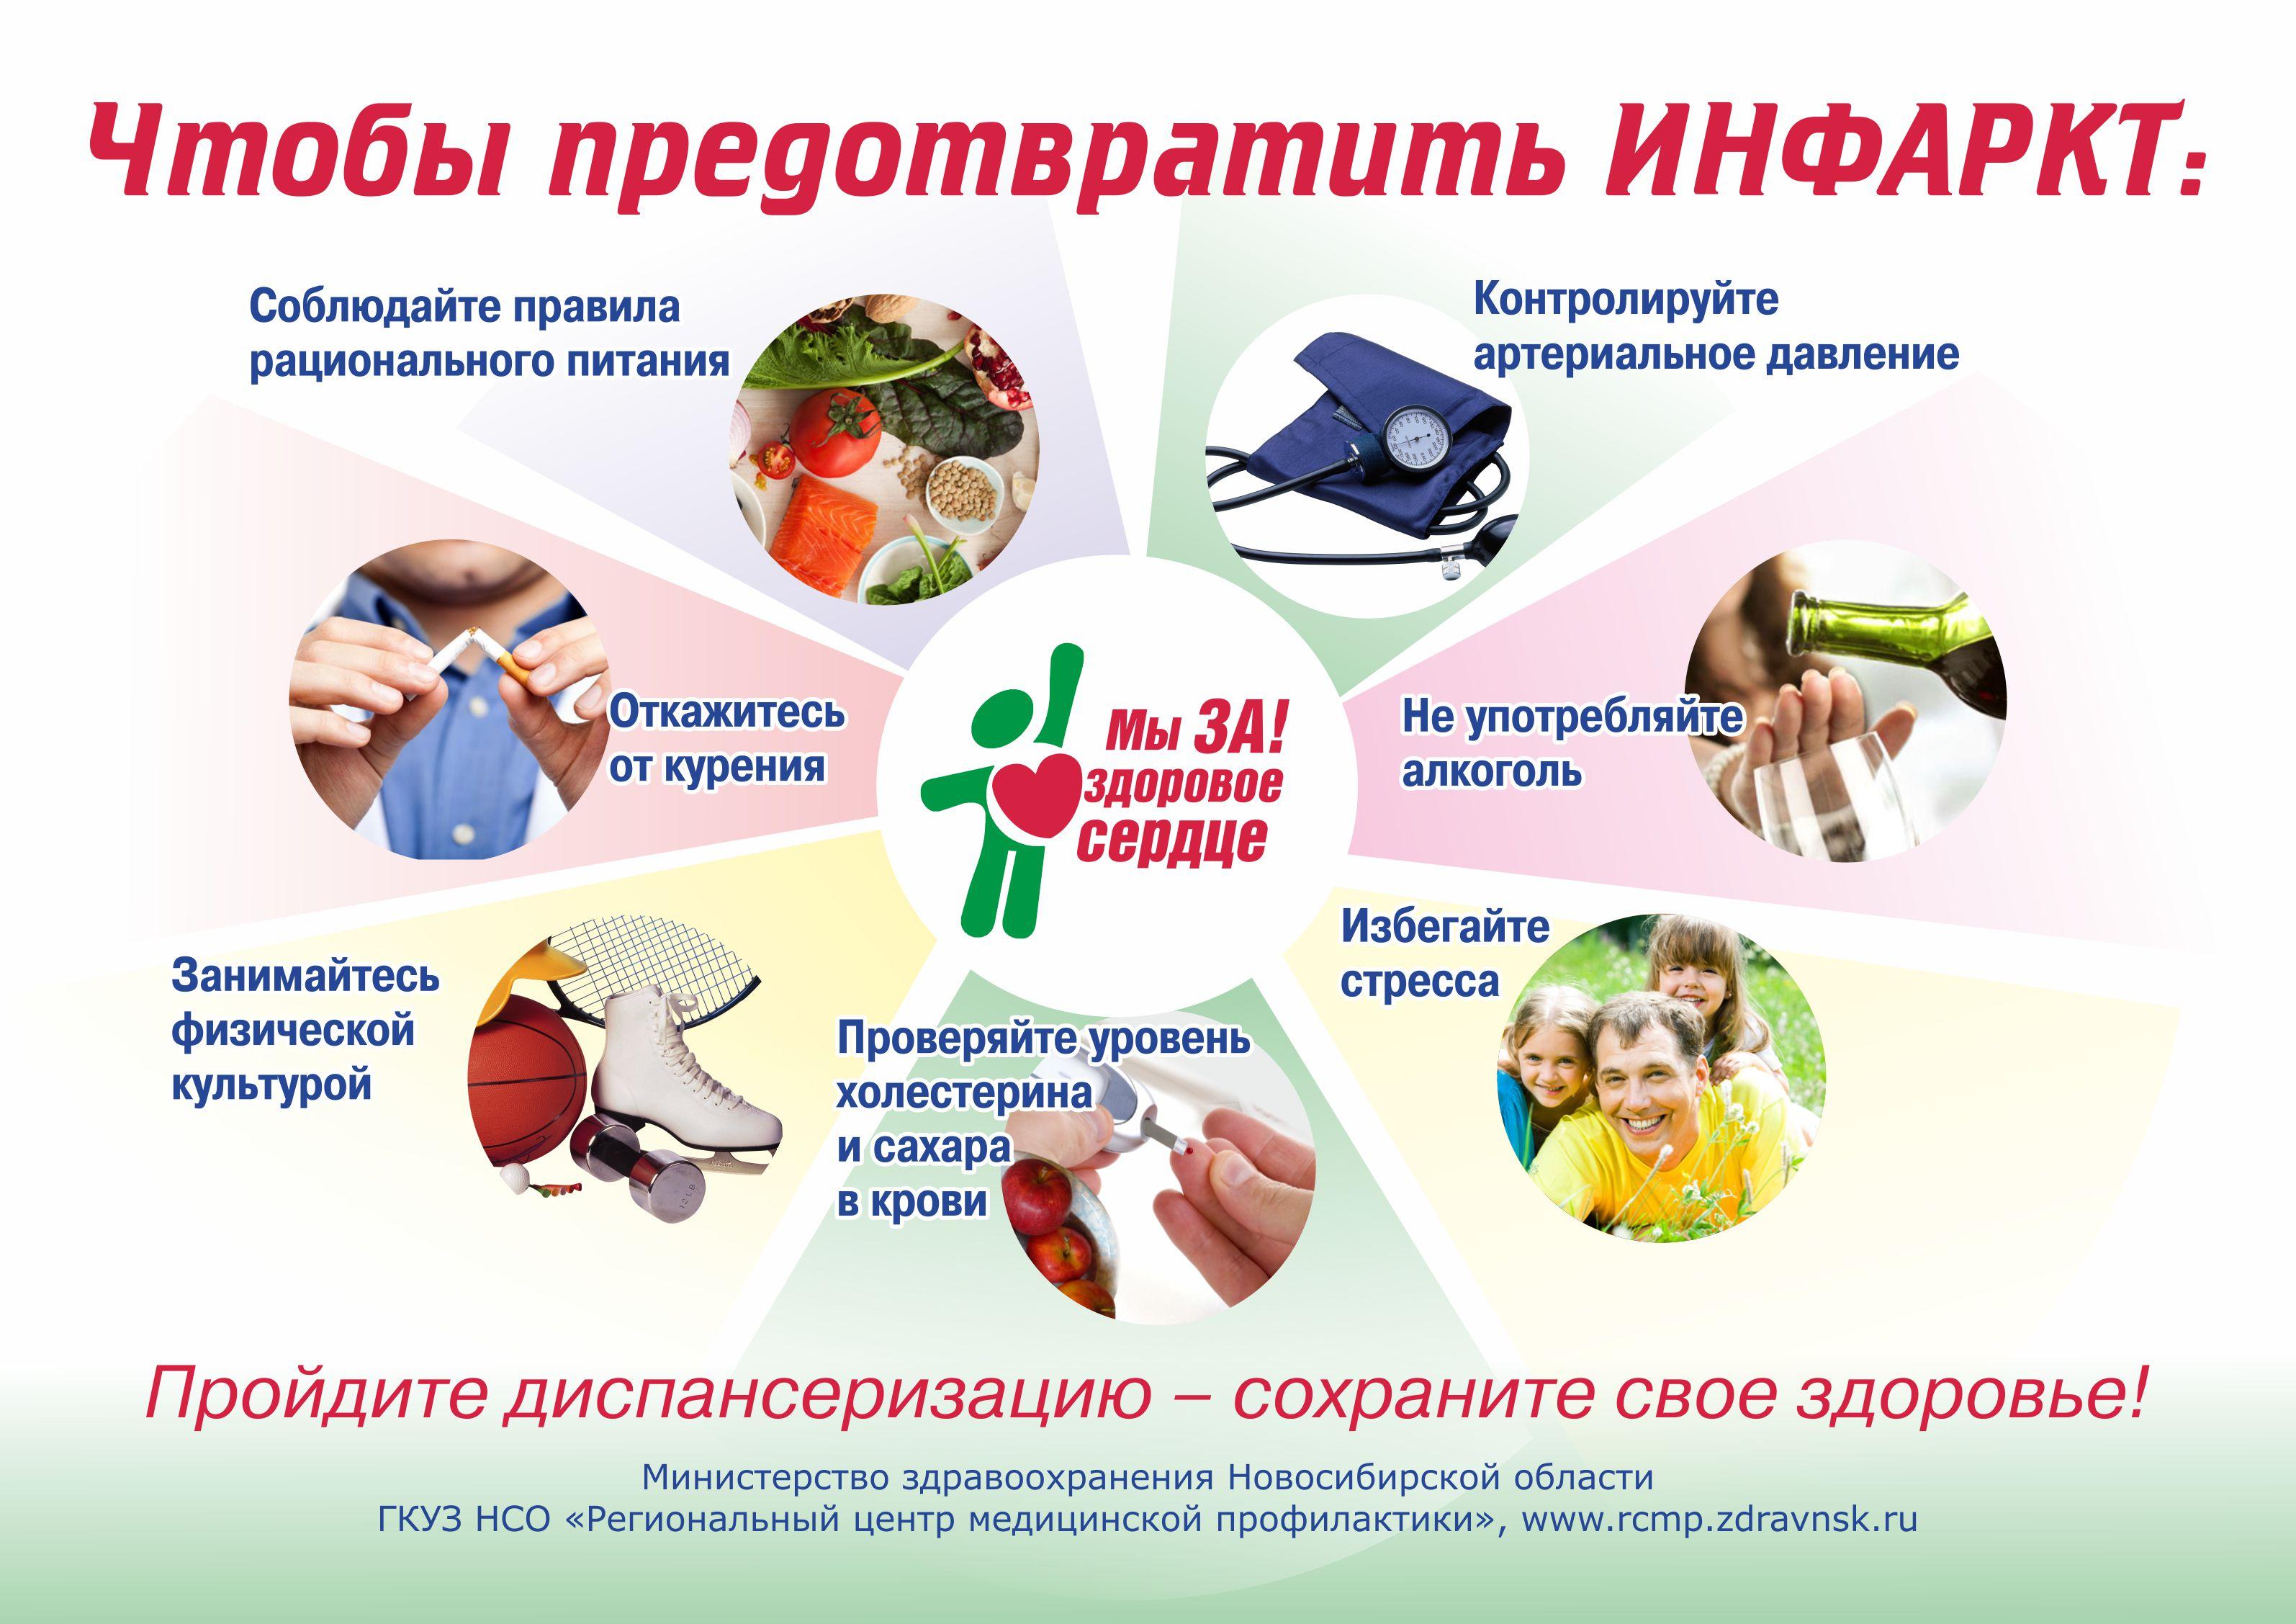 Как предупредить инфаркт или профилактика инфаркта миокарда